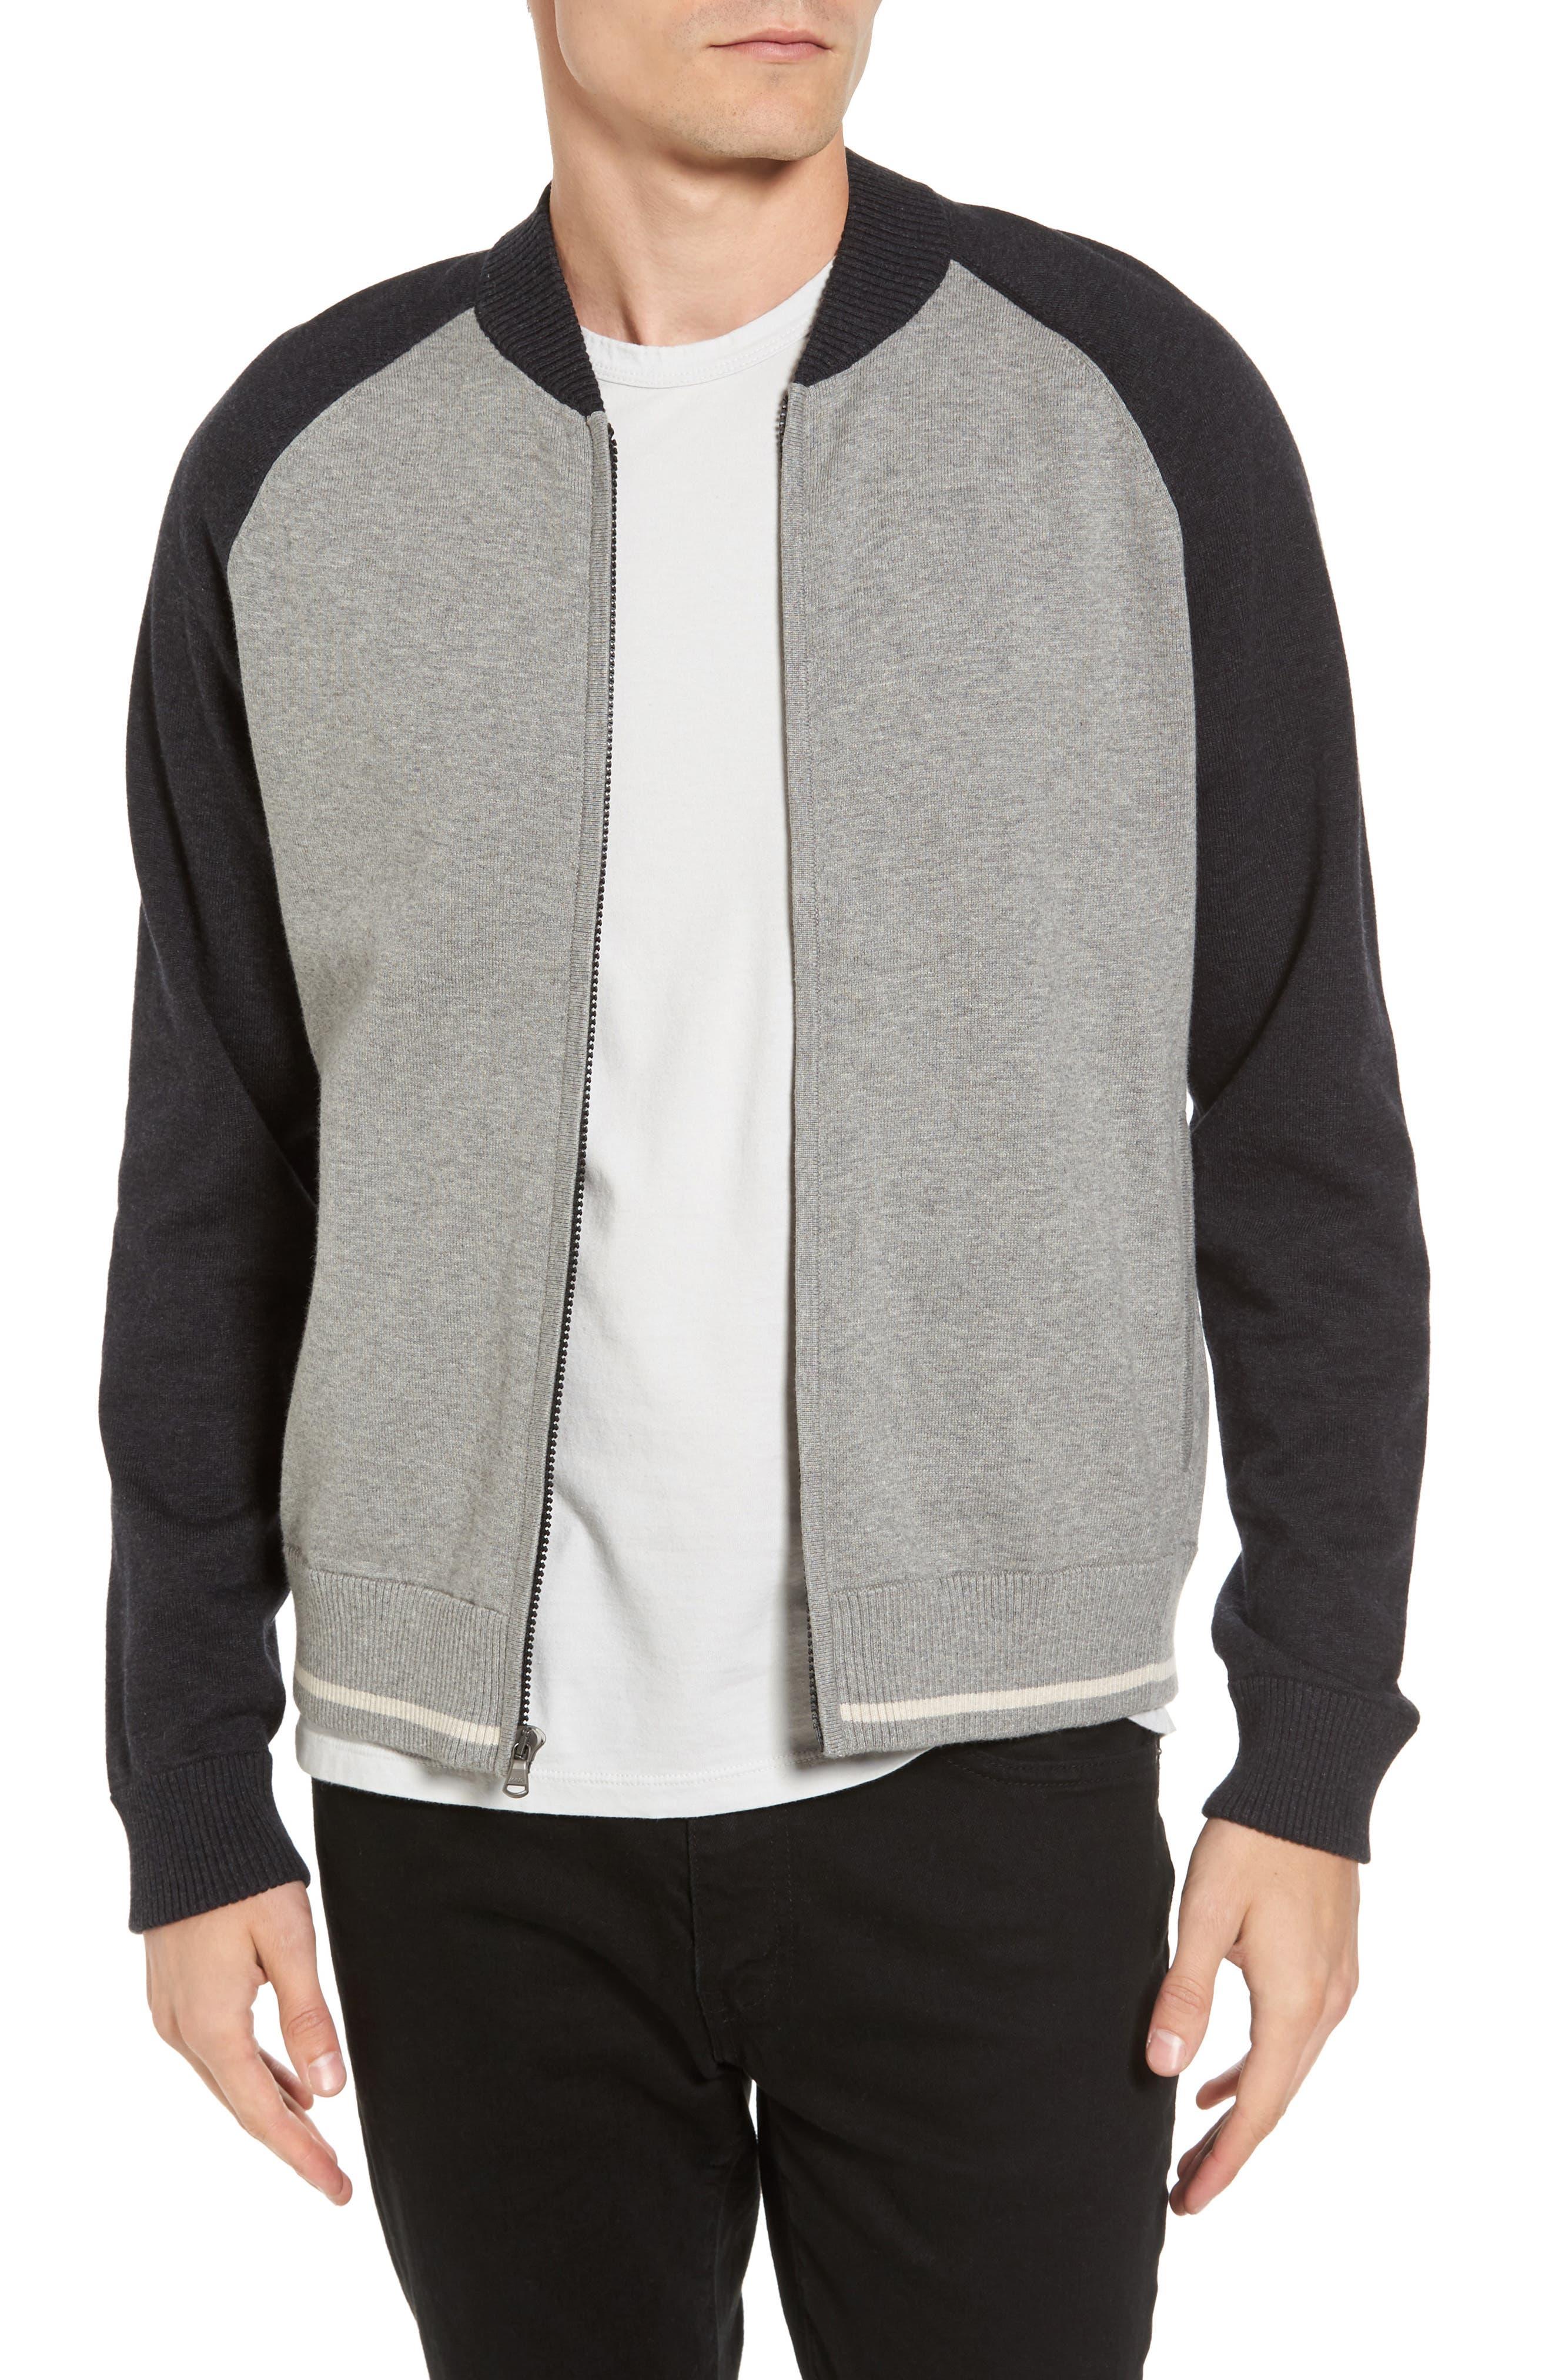 Colorblock Knit Track Jacket,                         Main,                         color, Hgy/ Ntsh/ Lin